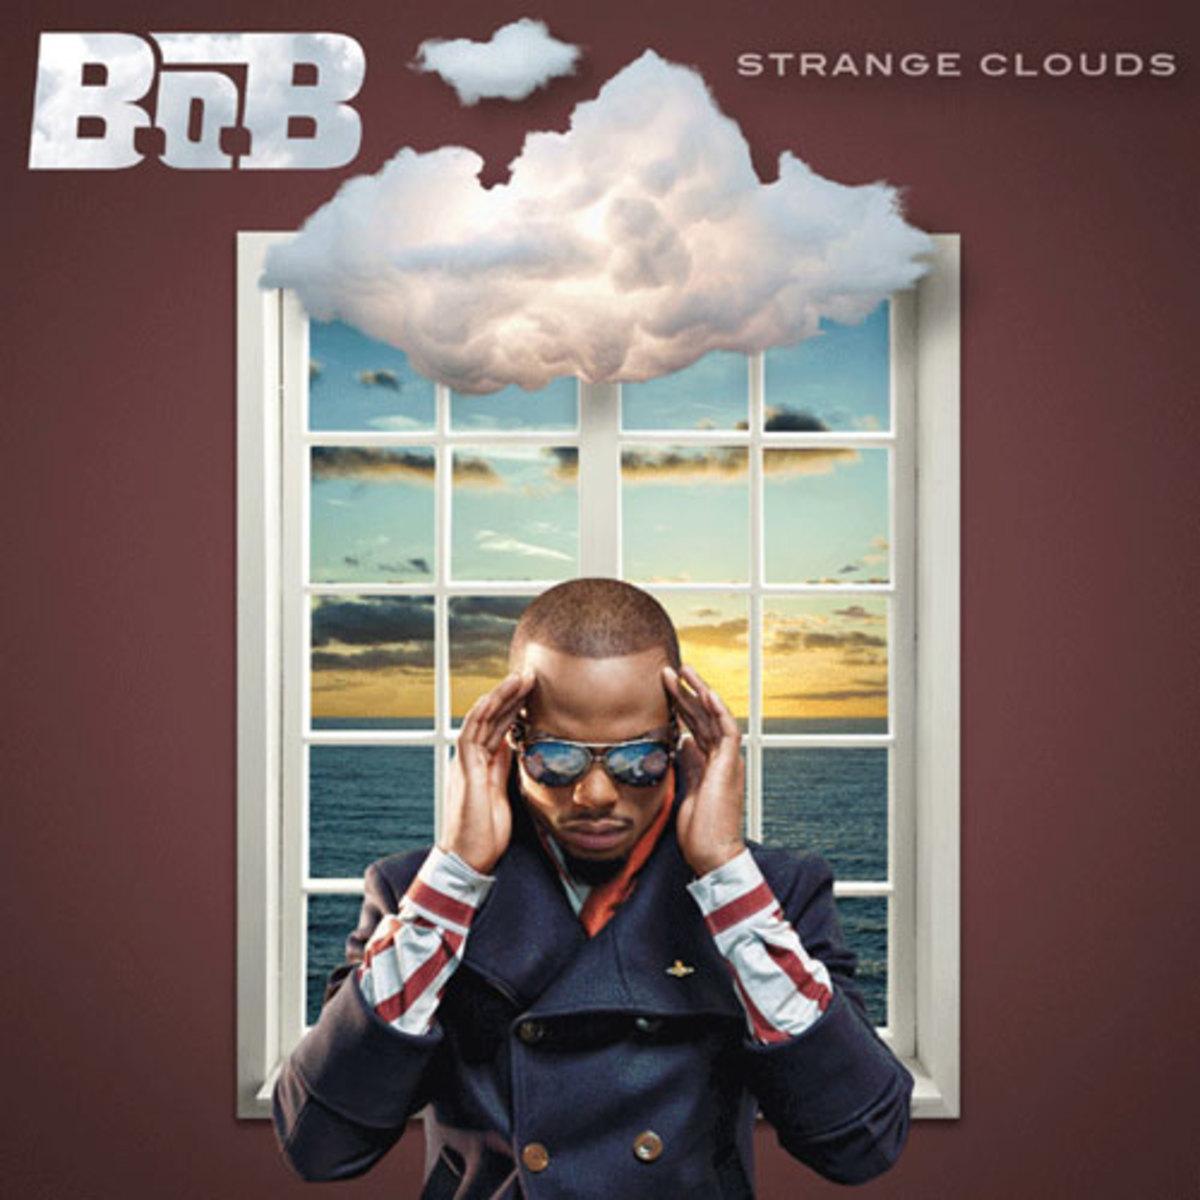 bob-strangecloudsalbum.jpg